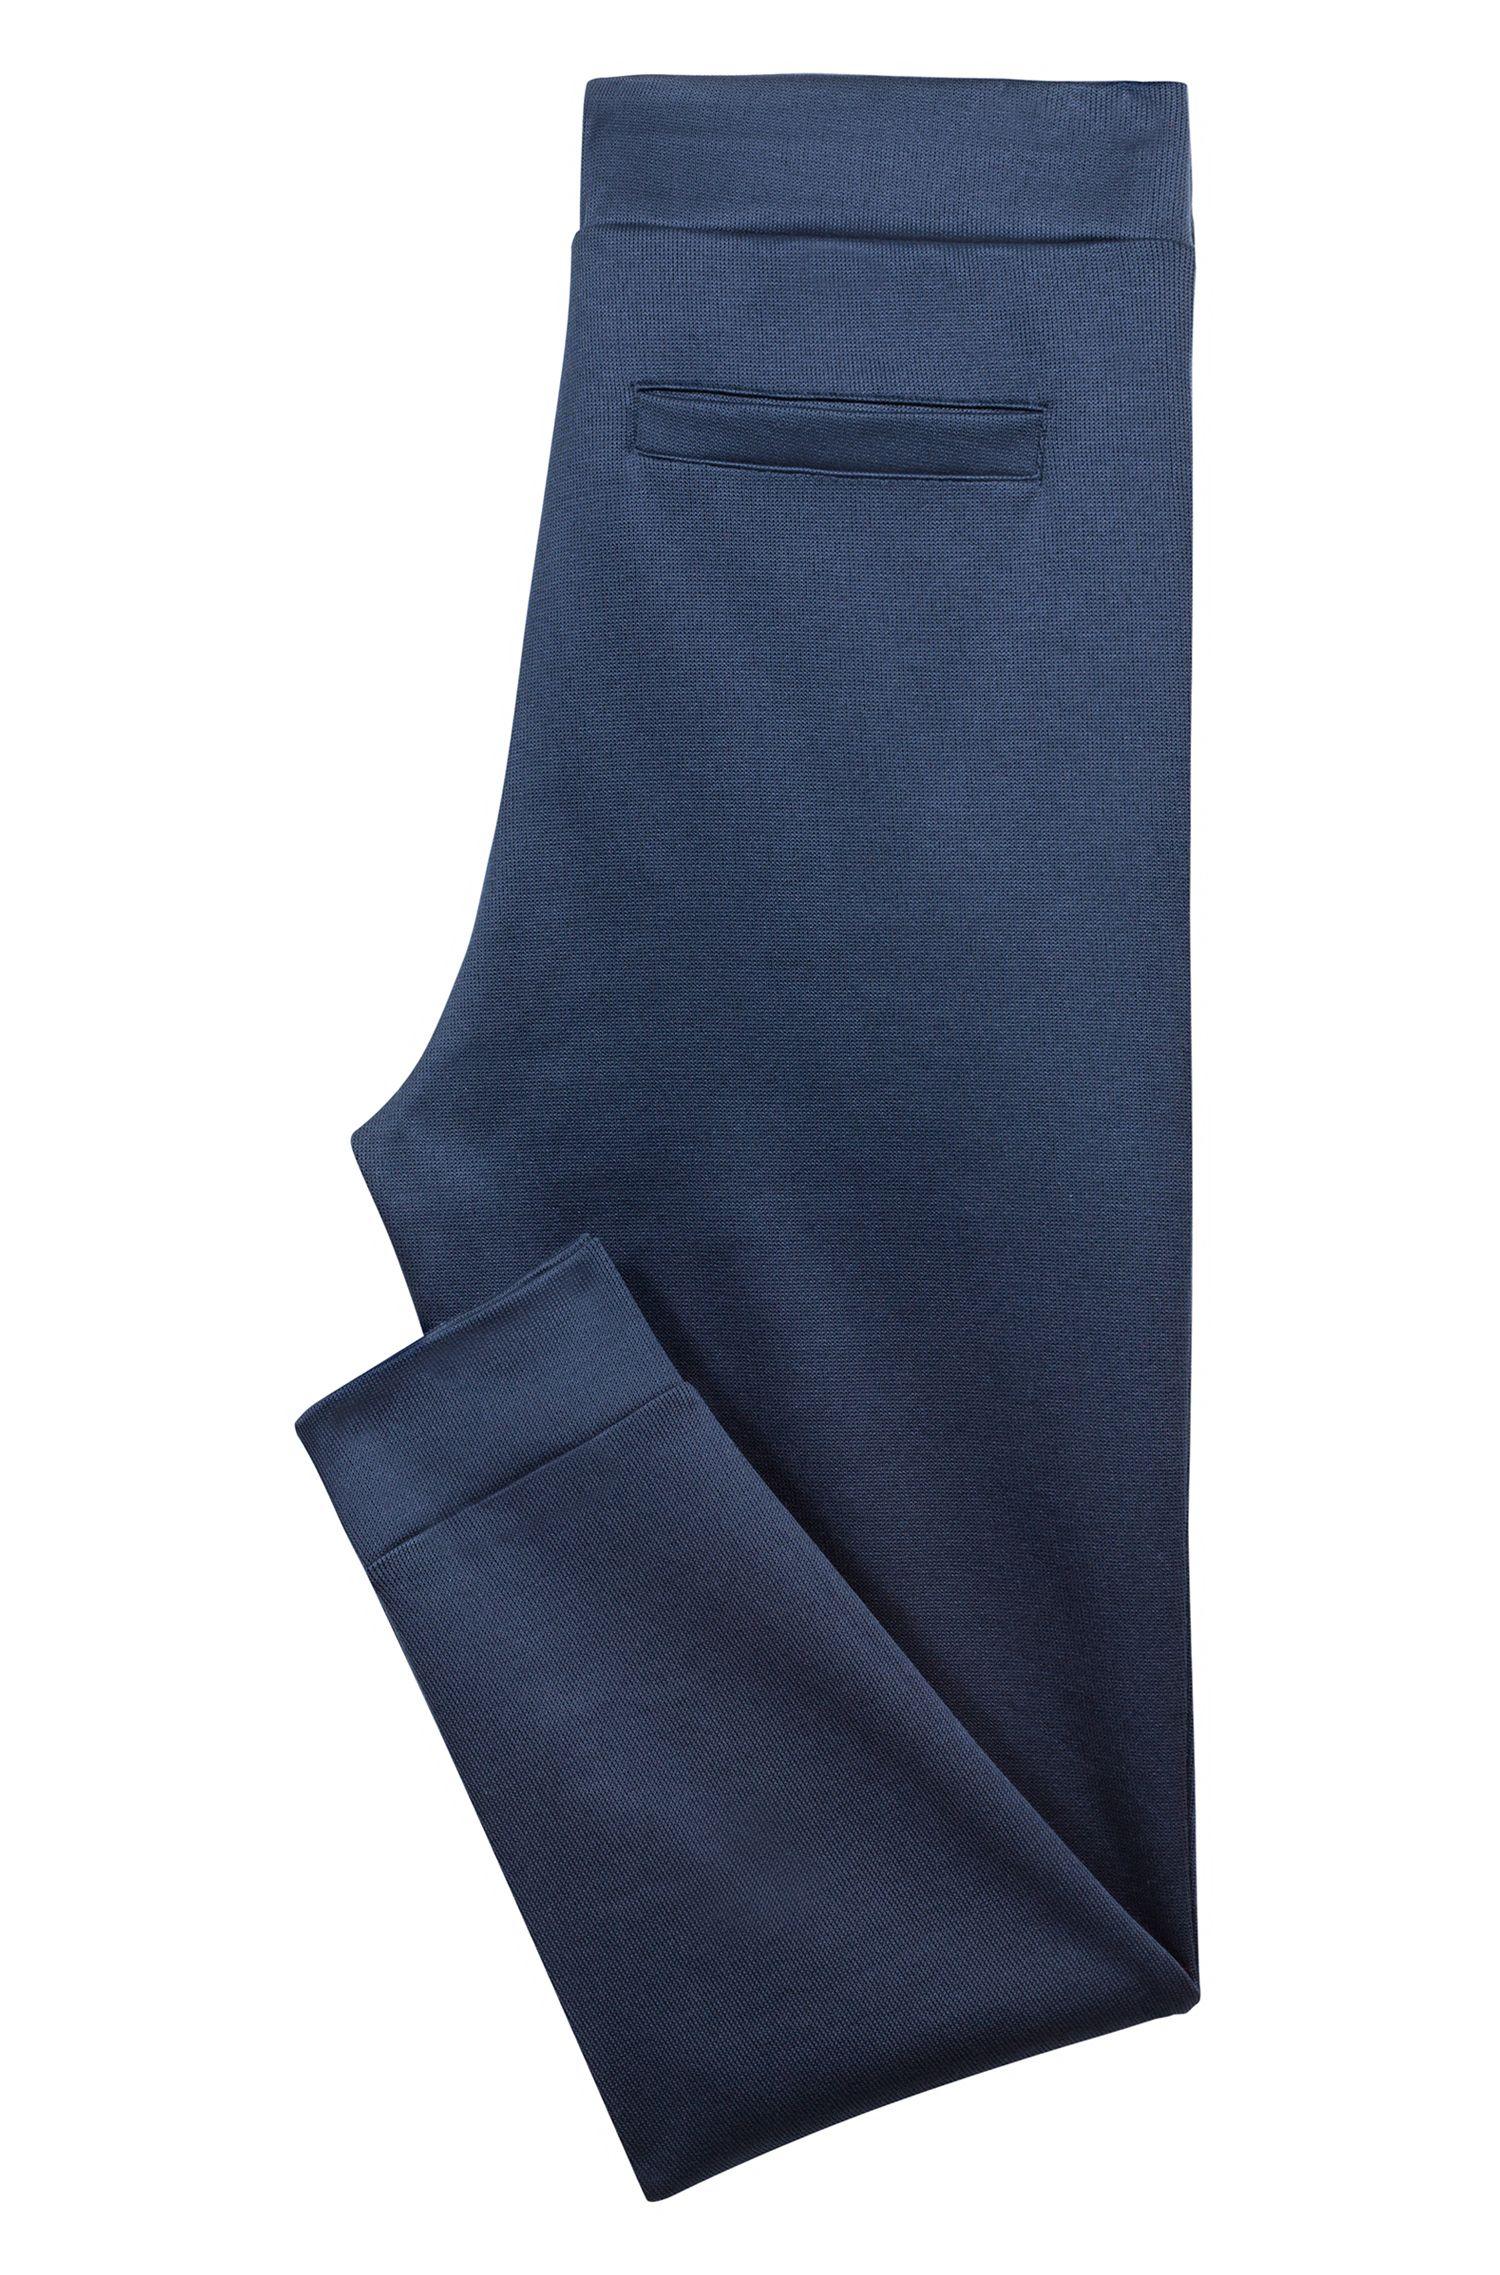 Jersey broek van Frans ribmateriaal met tailleband met trekkoord, Donkerblauw